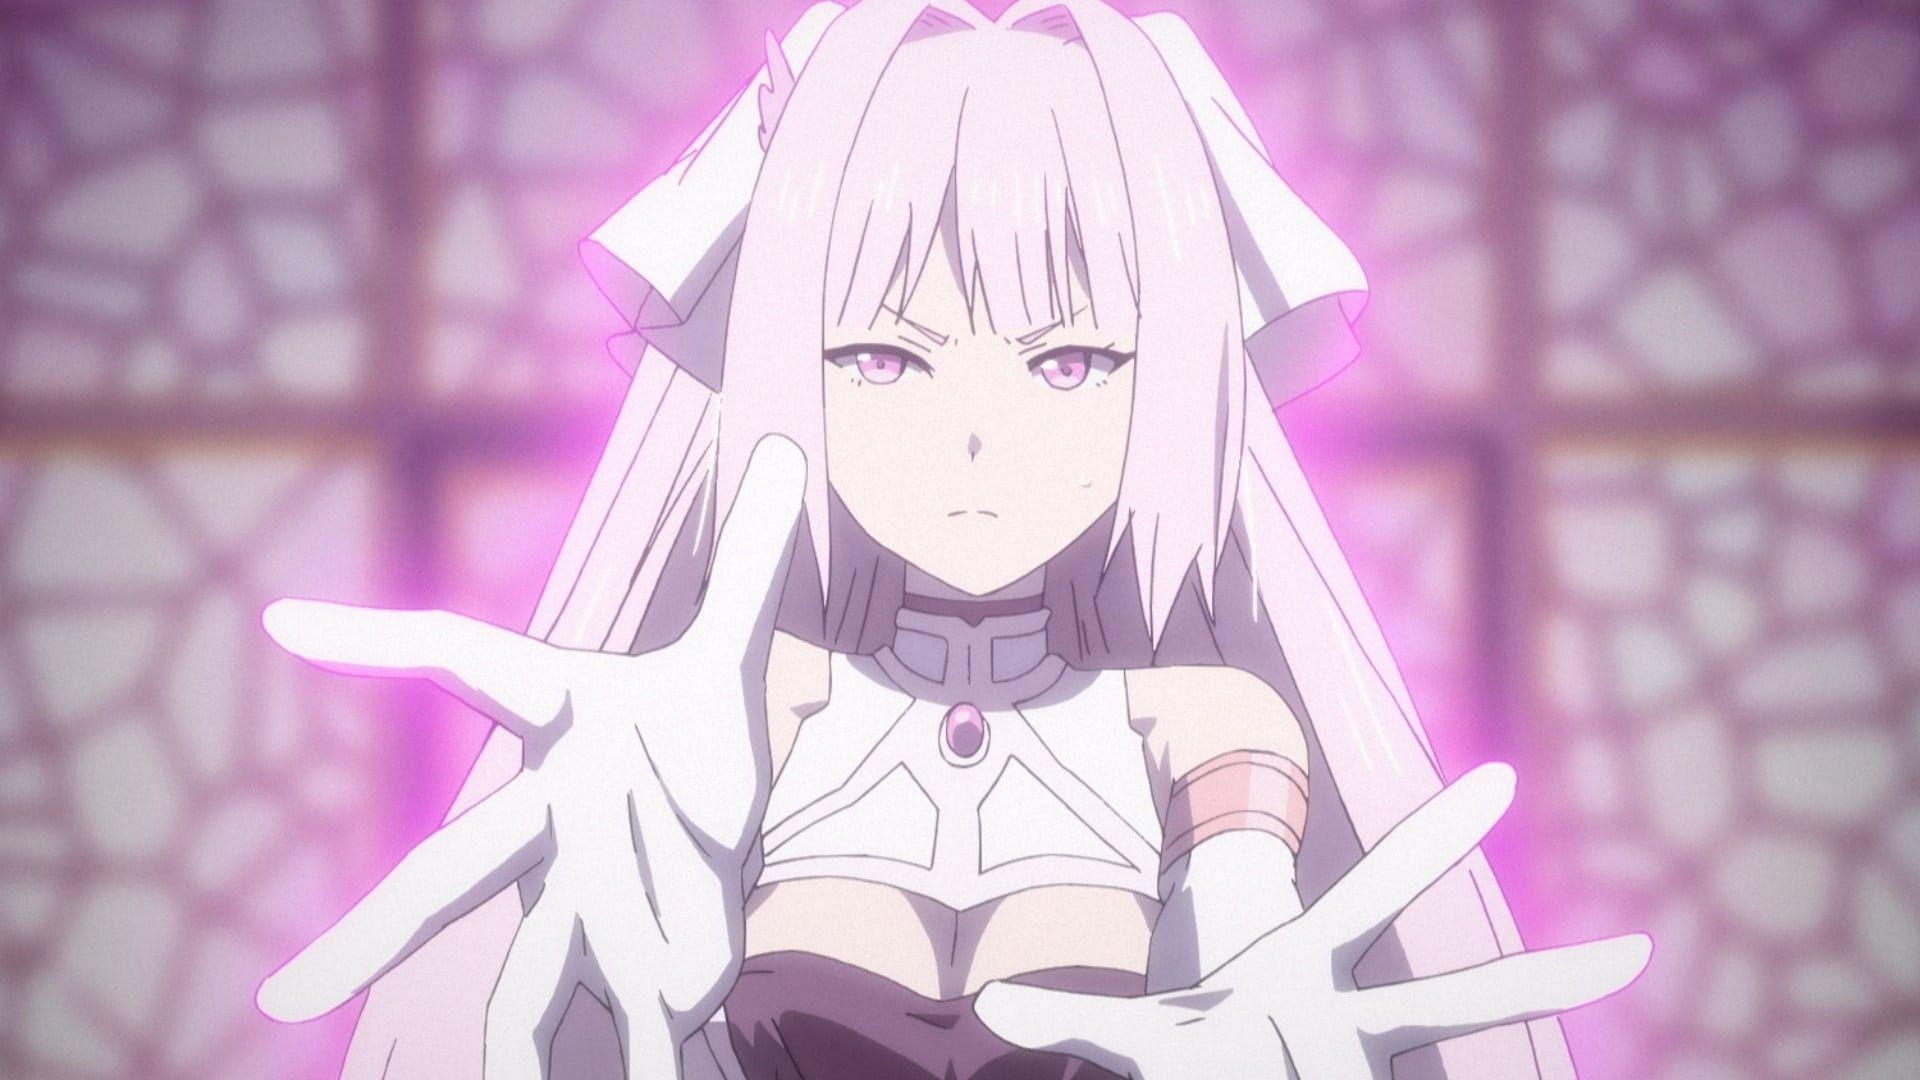 Pin de Anime HS en MaouSama Retry! en 2020 Maou sama